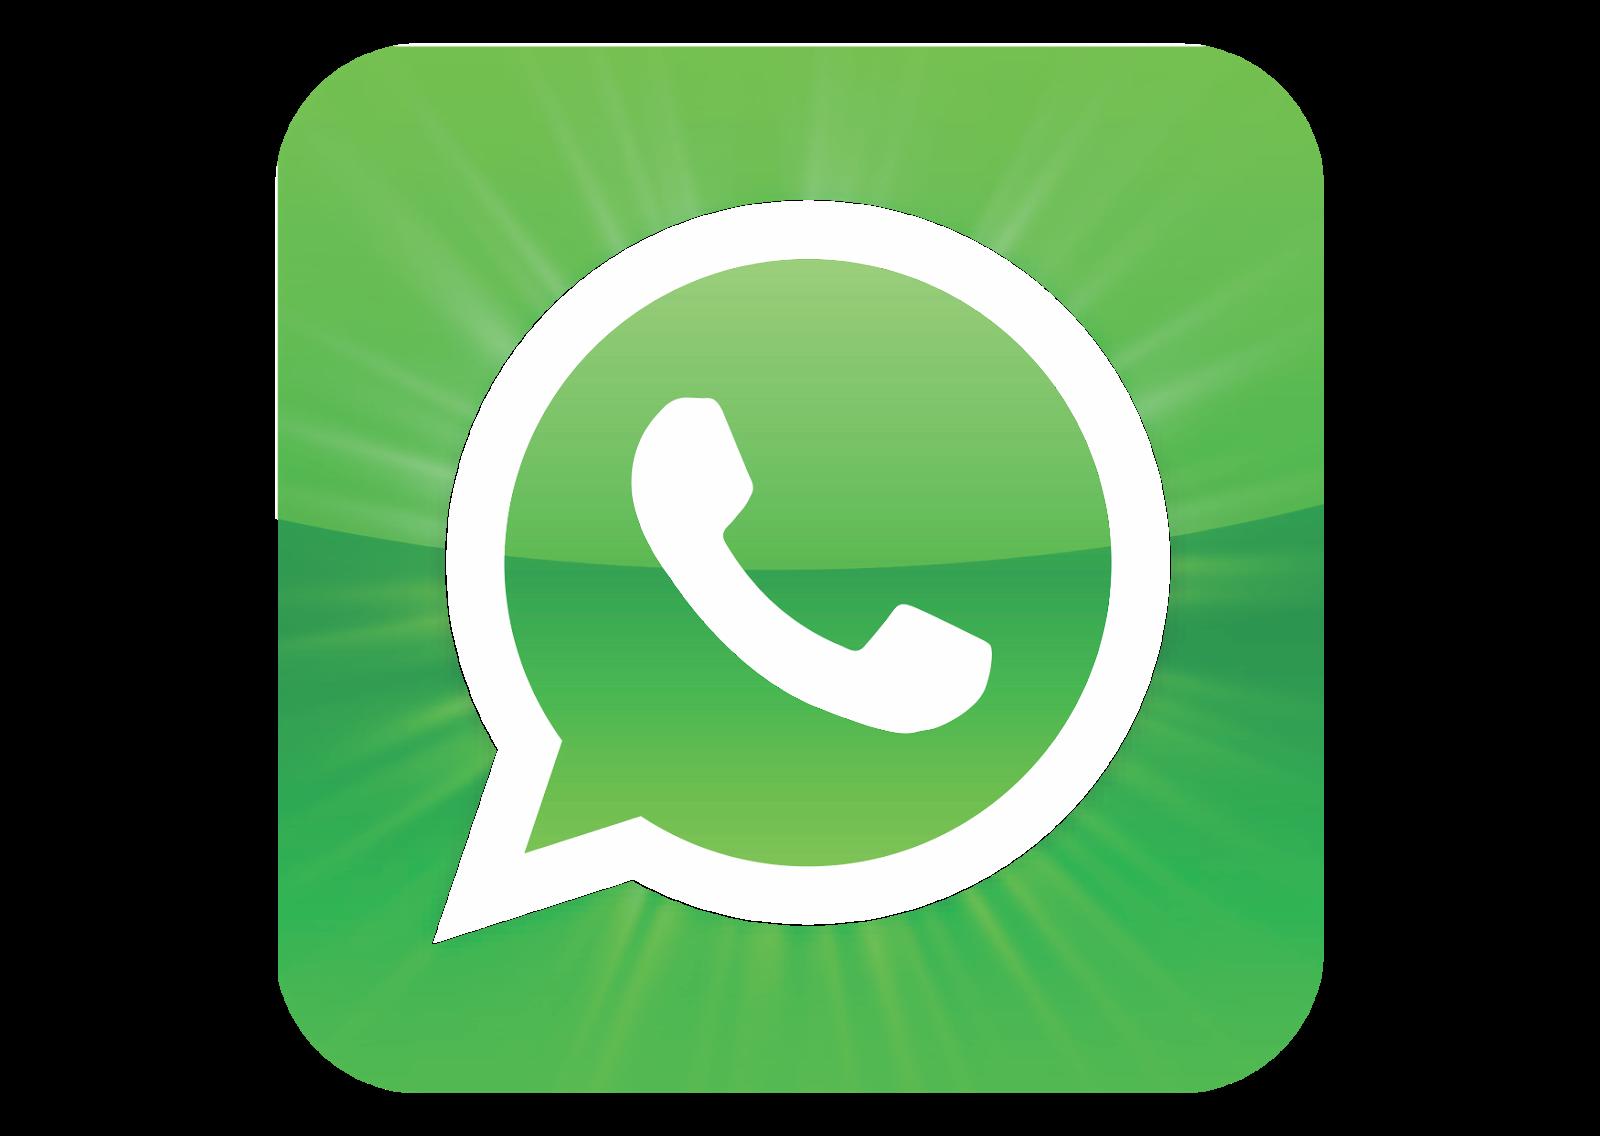 Whatsapp Logo PNG - 175541